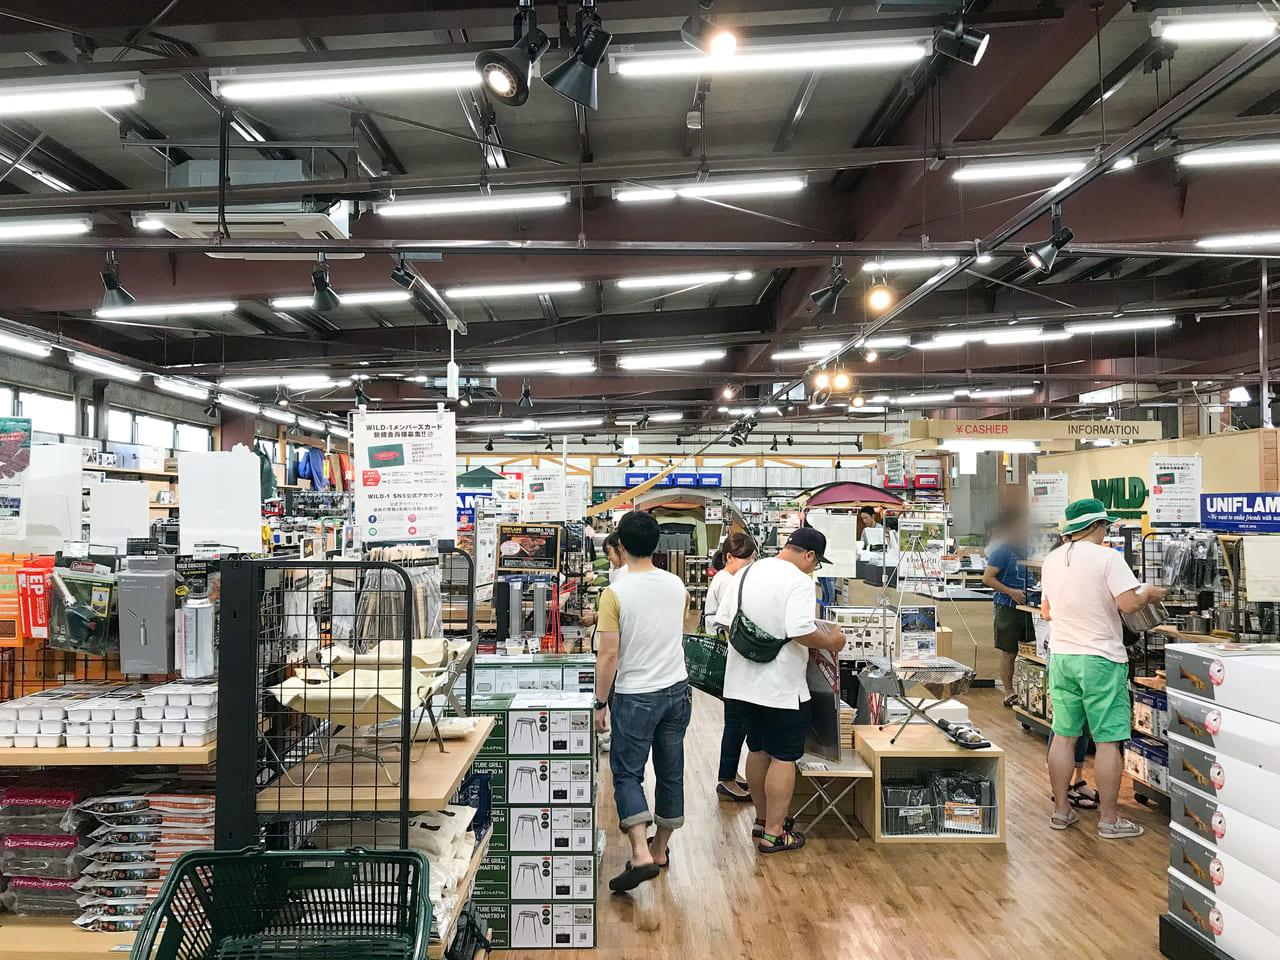 /WILD-1多摩ニュータウン店はフロア面積が広く様々なアイテムが展示されている